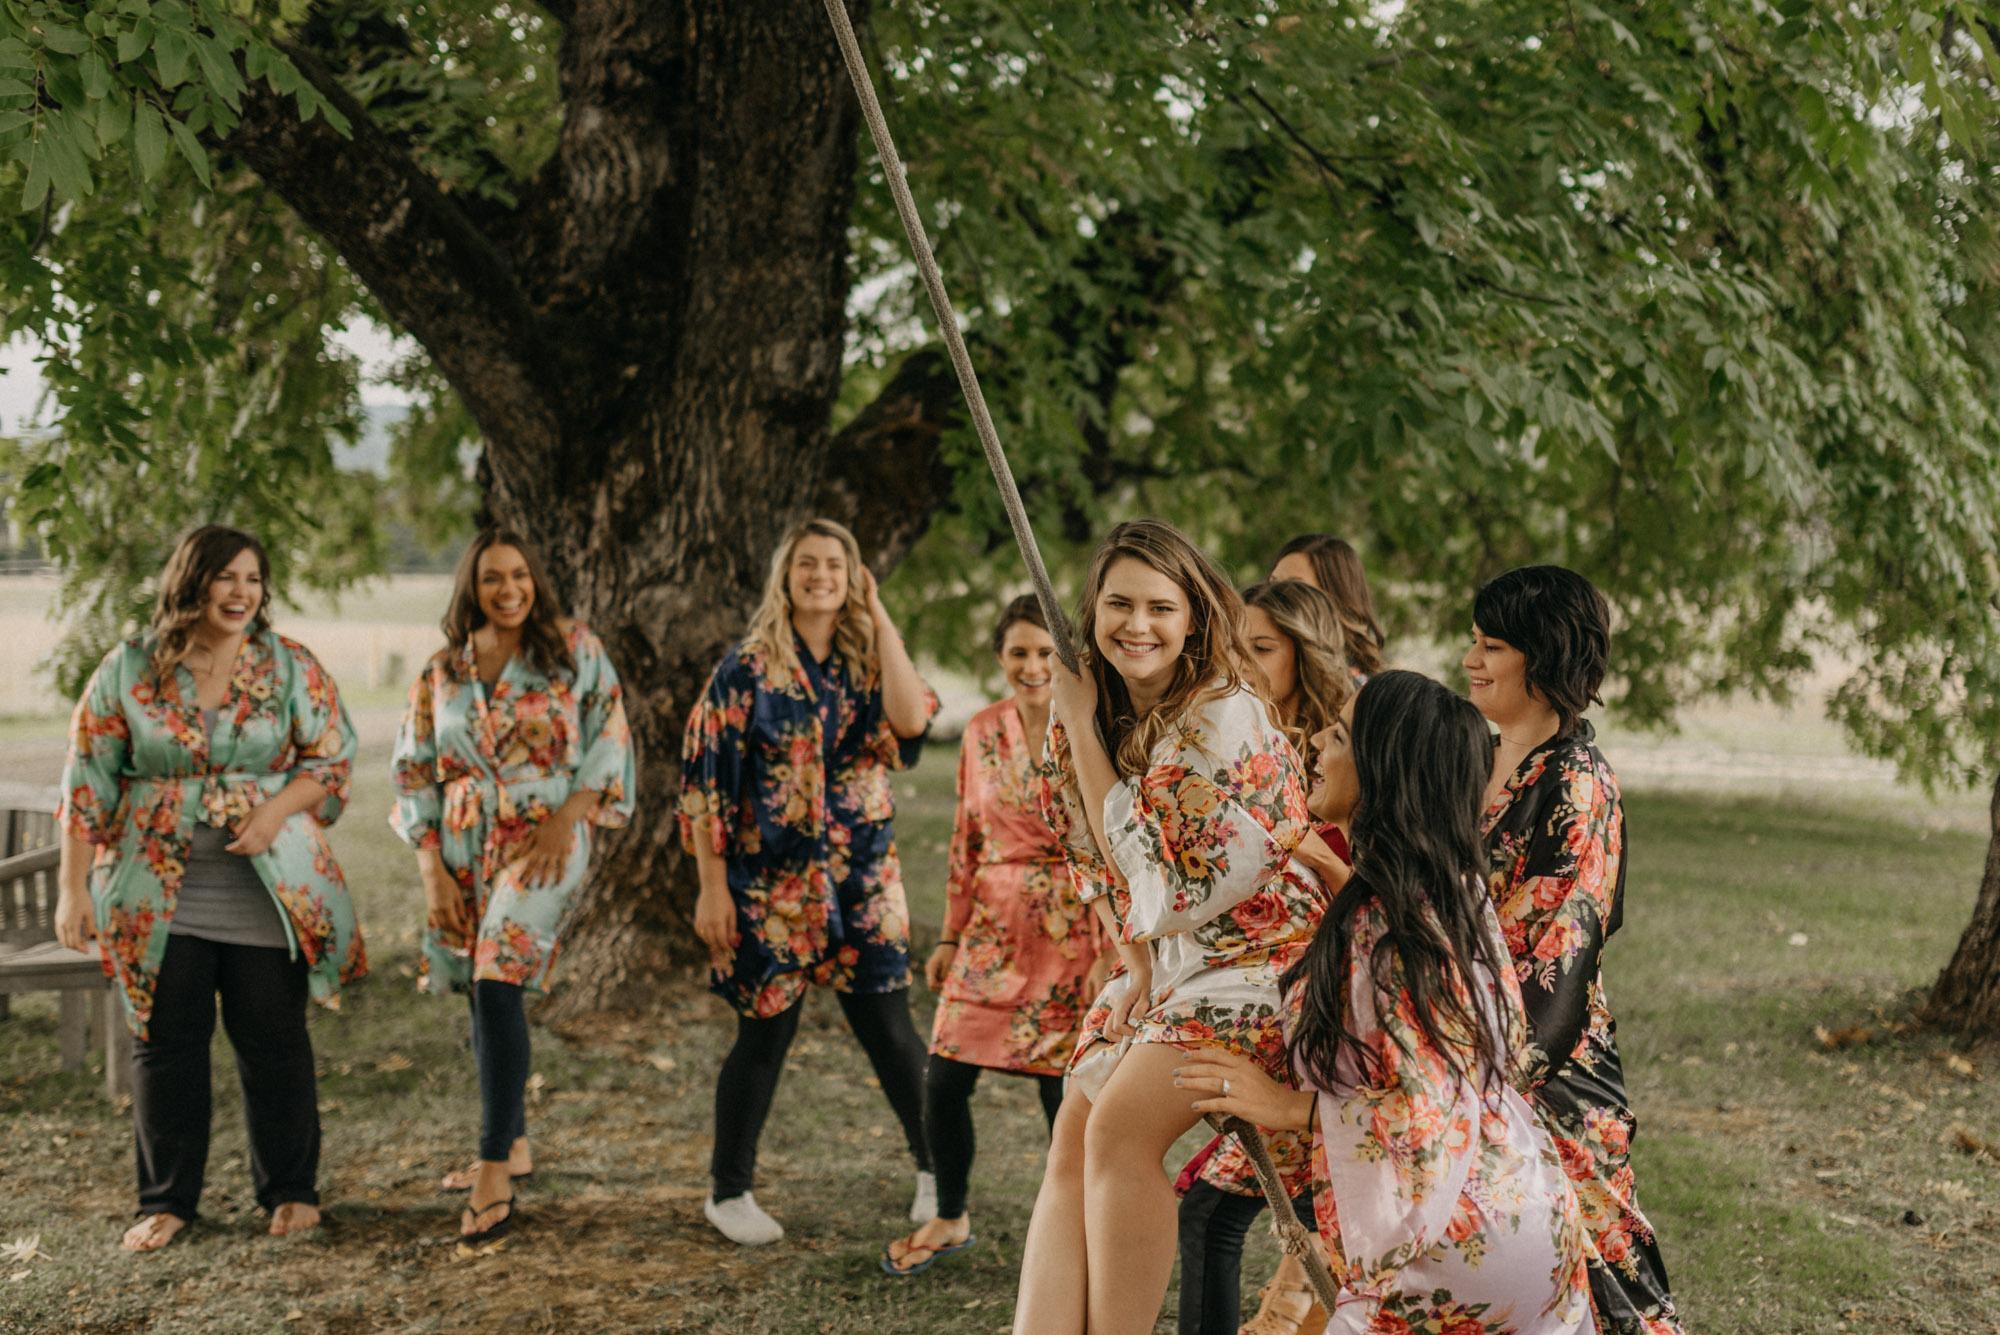 Getting-Ready-Swingset-Washington-Wedding-ringshot-7895.jpg